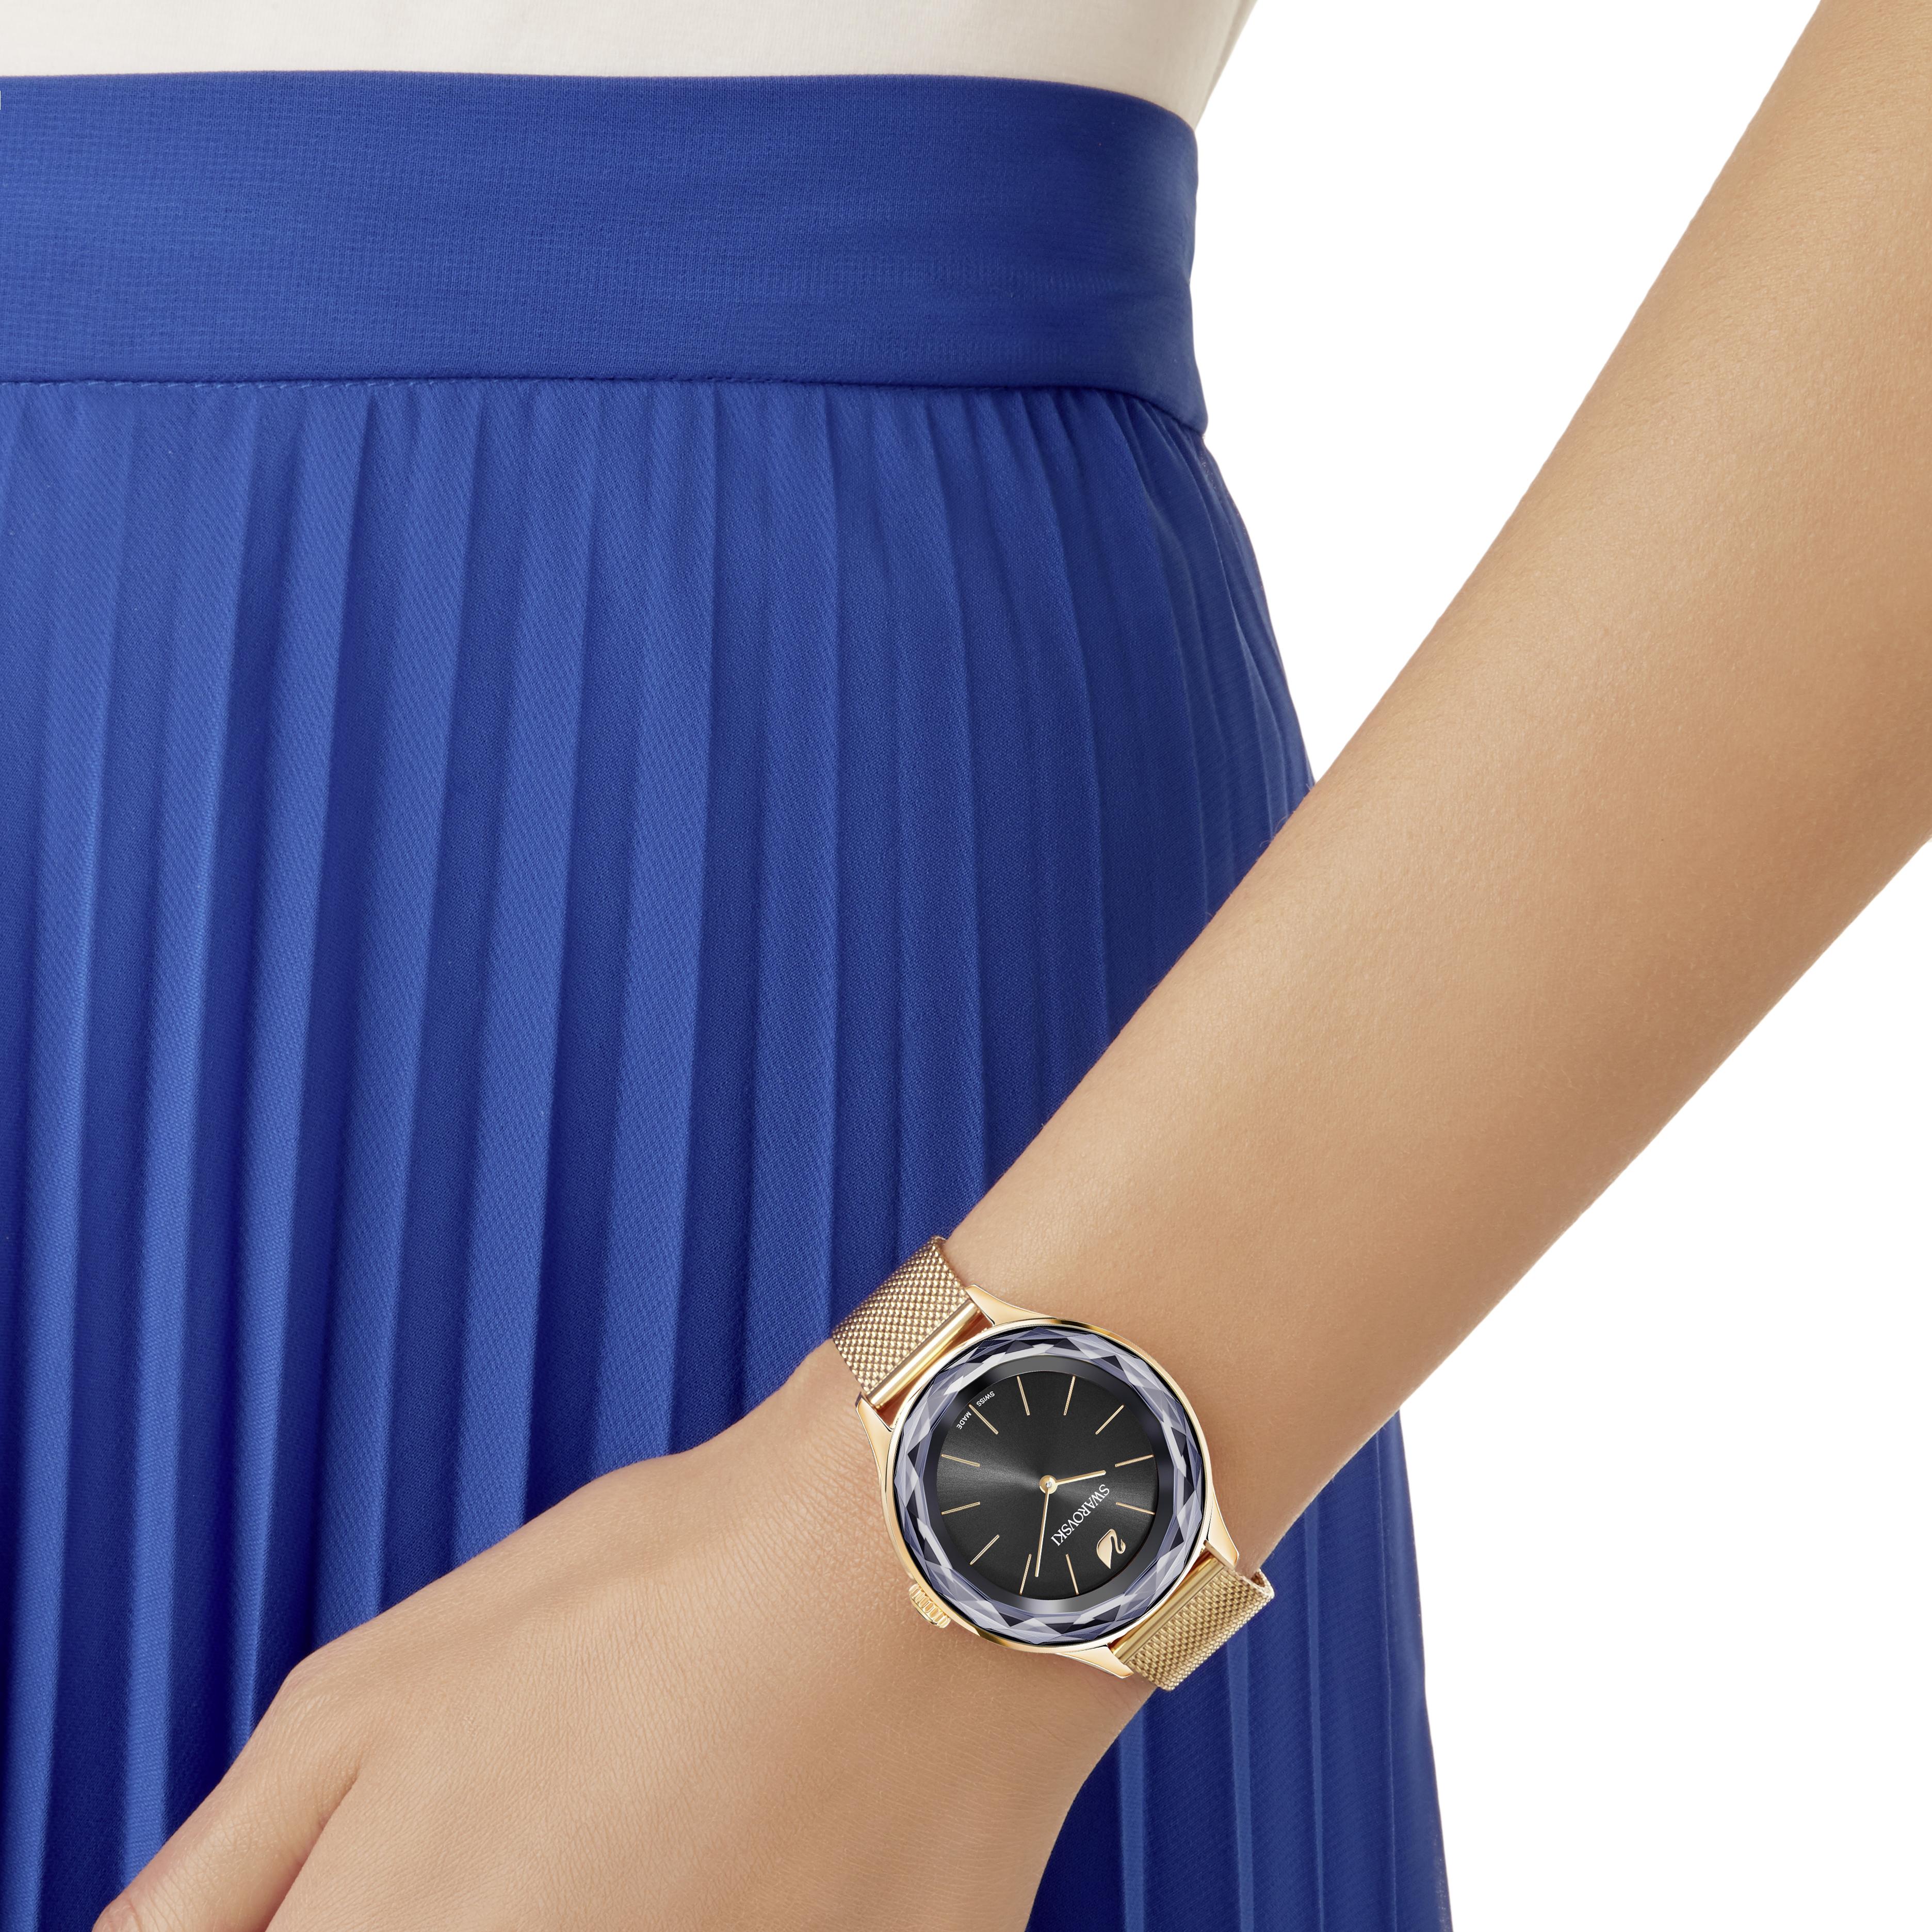 Octea Nova Watch, Milanese Bracelet, Black, Rose Gold Tone